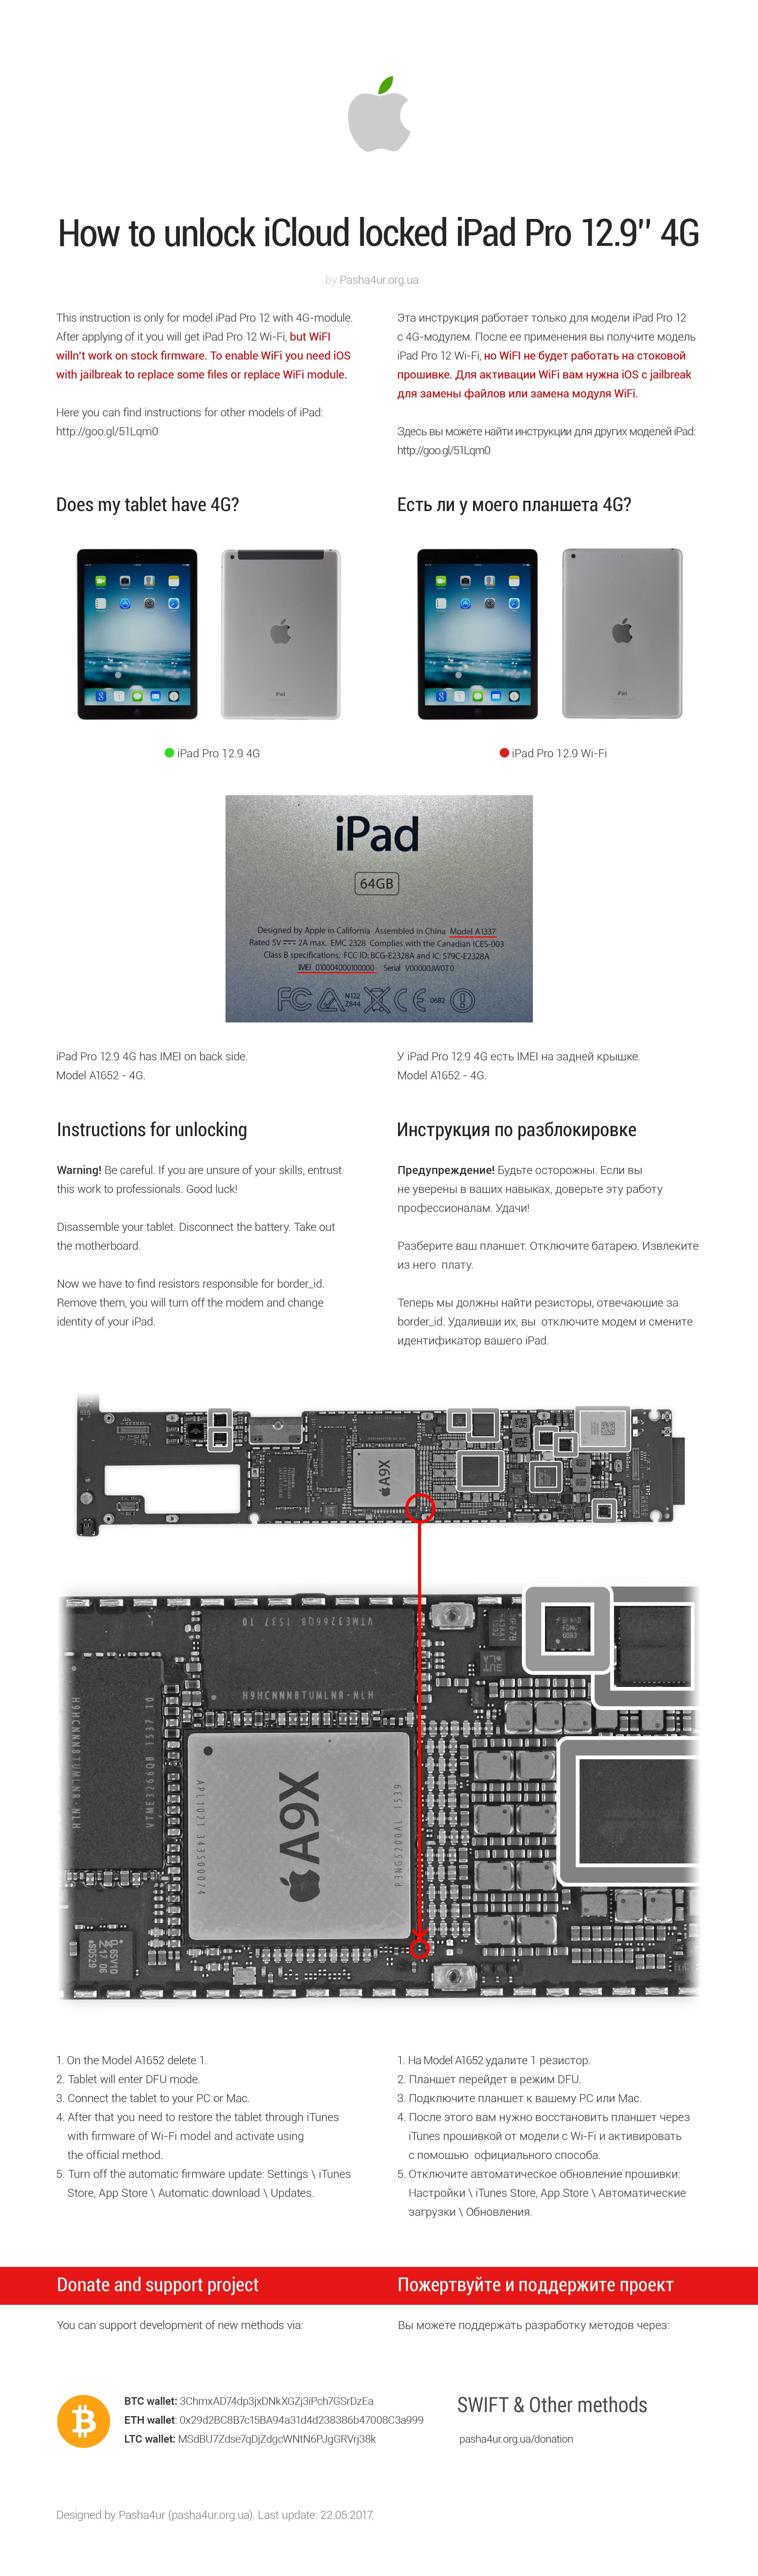 how to unlock icloud locked apple ipad 2 3 4 ipad air and air 2 rh pasha4ur org ua ipad 2 firmware update problem ipad air 2 firmware update